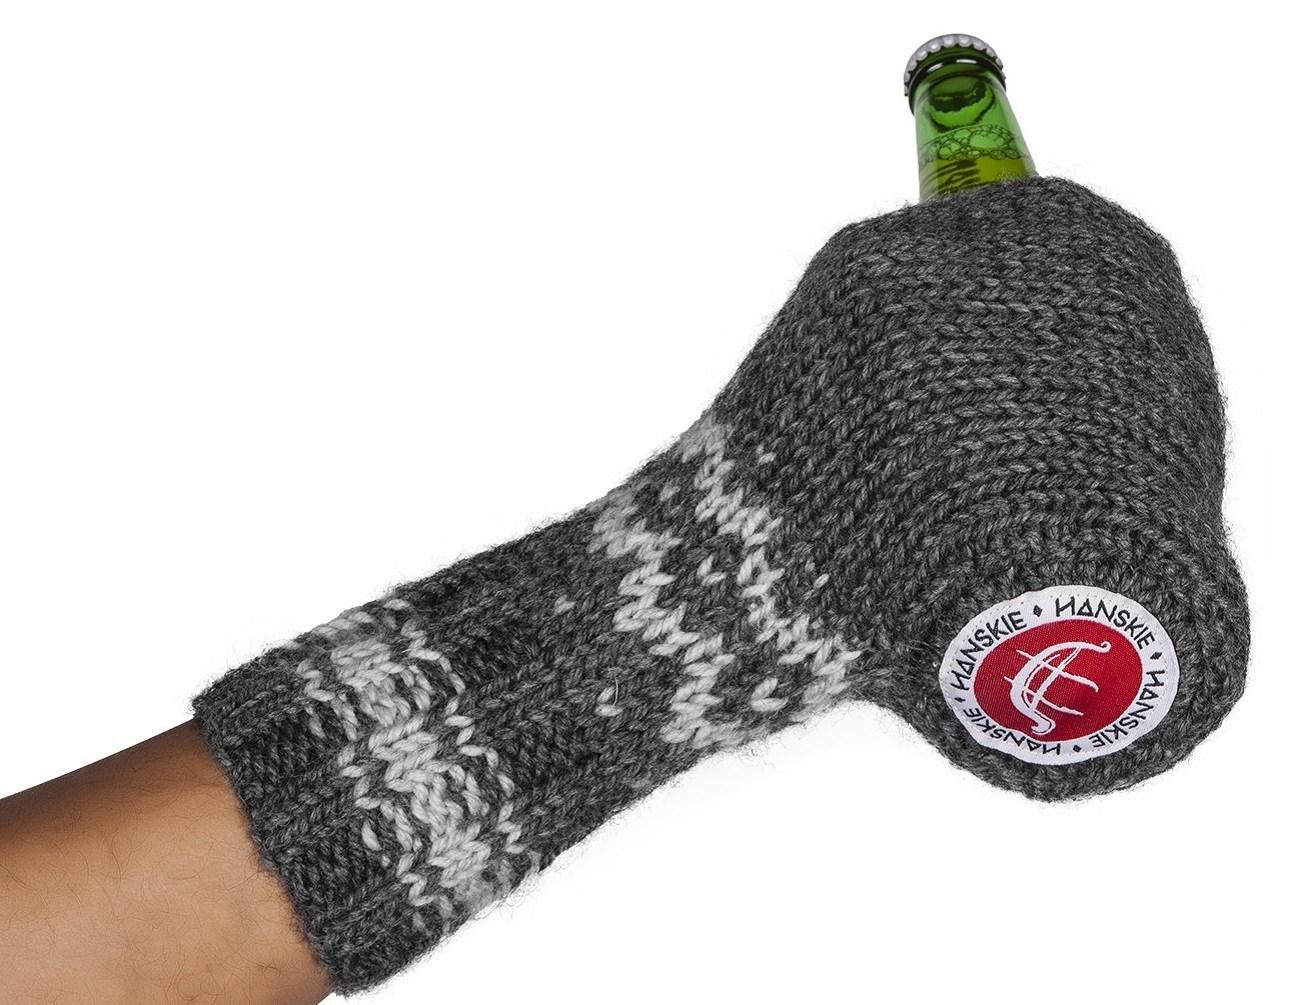 Skuuzi Glove